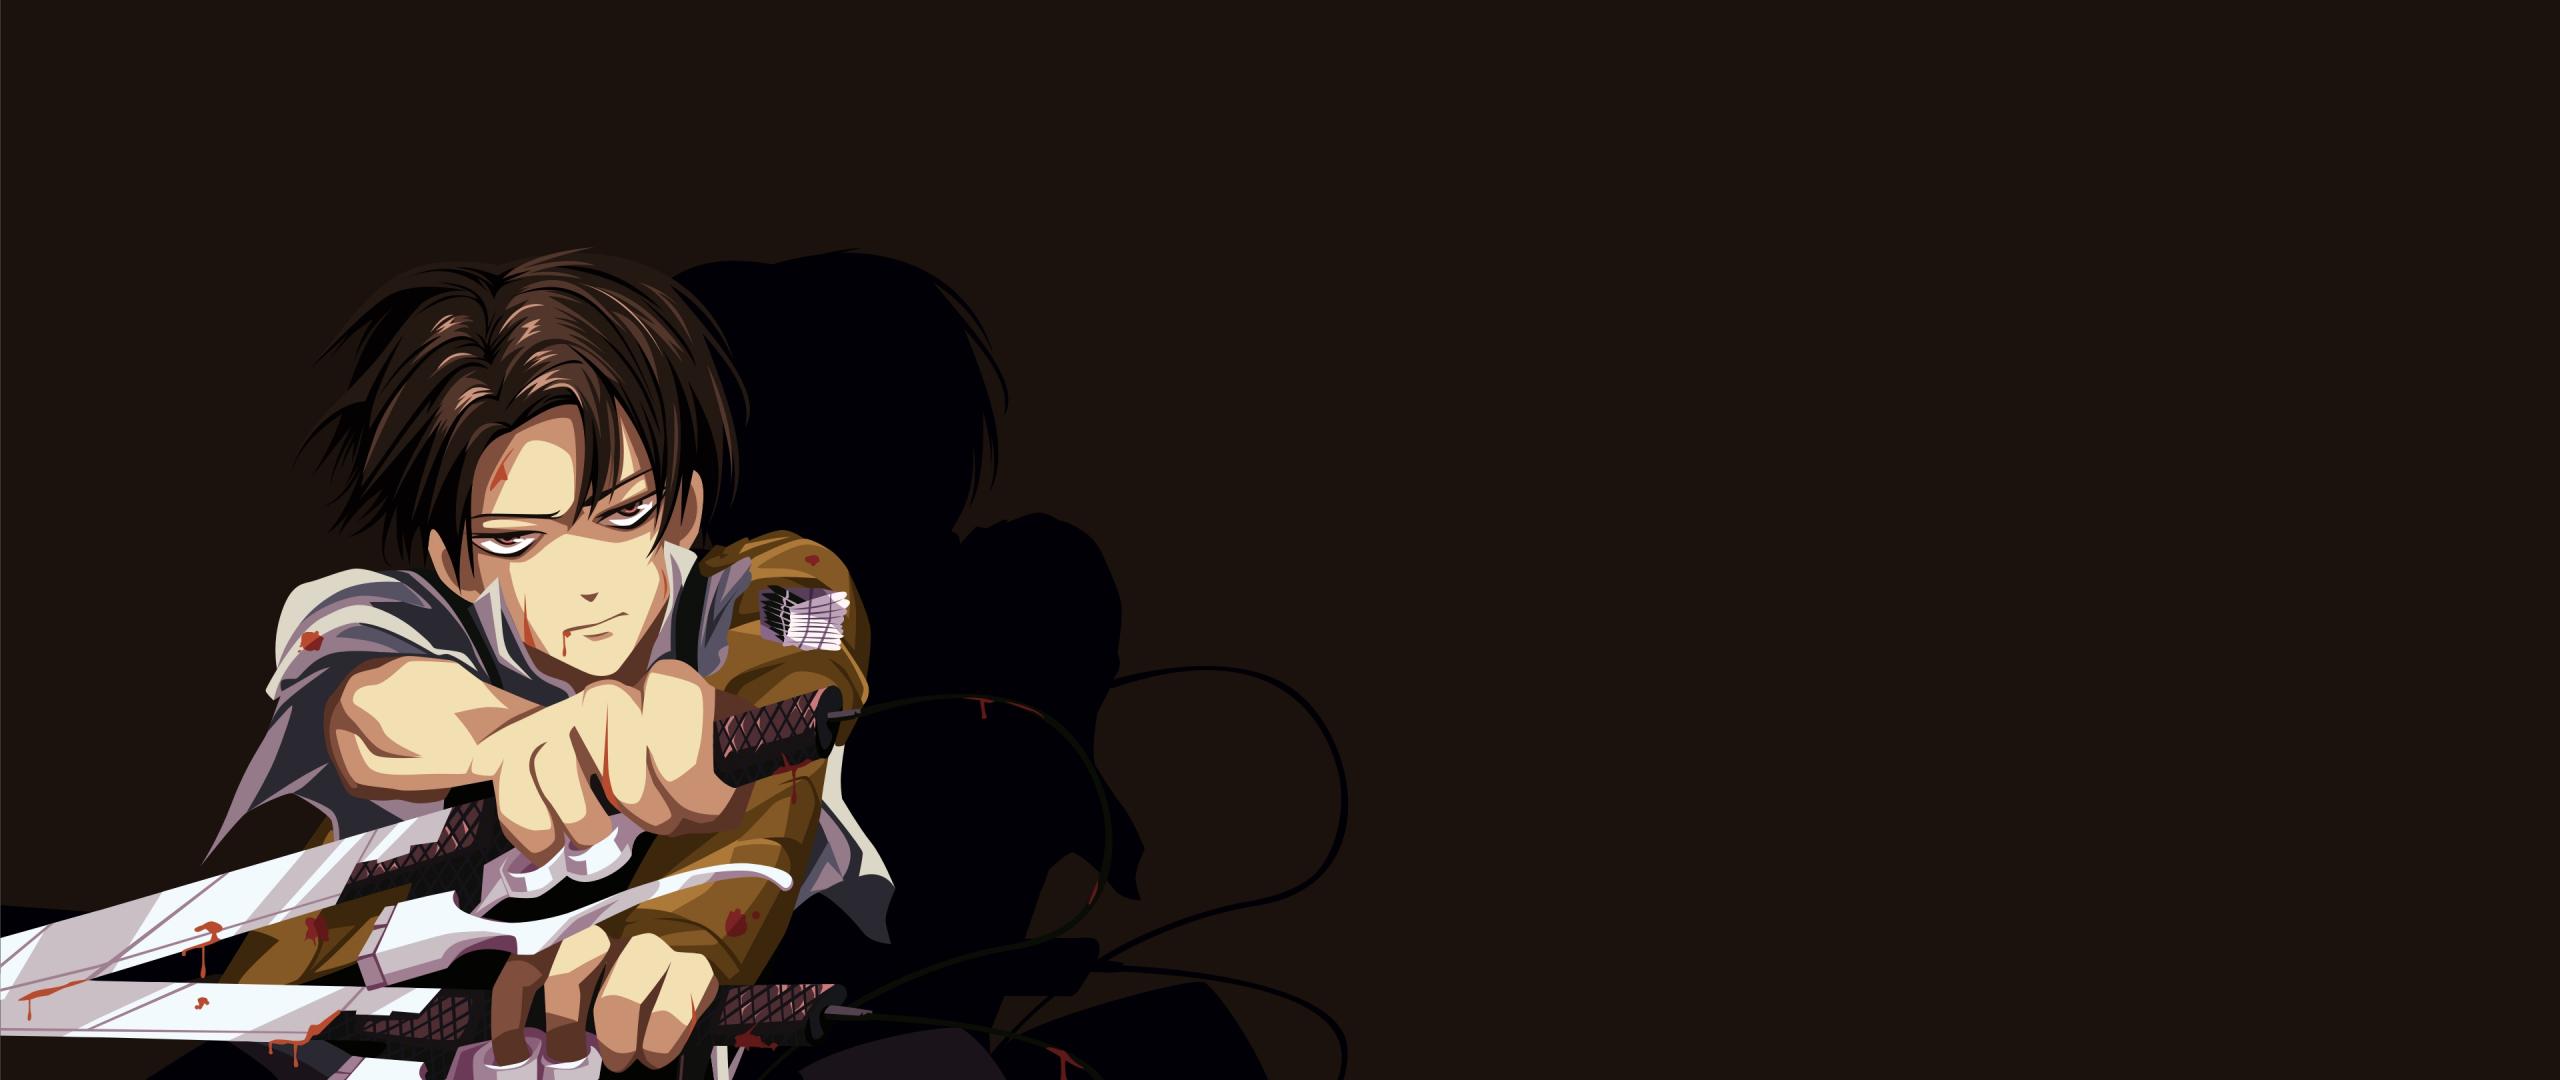 Desktop Wallpaper Anime Boy Levi Ackerman Attack On Titan Hd Image Picture Background Cylb F